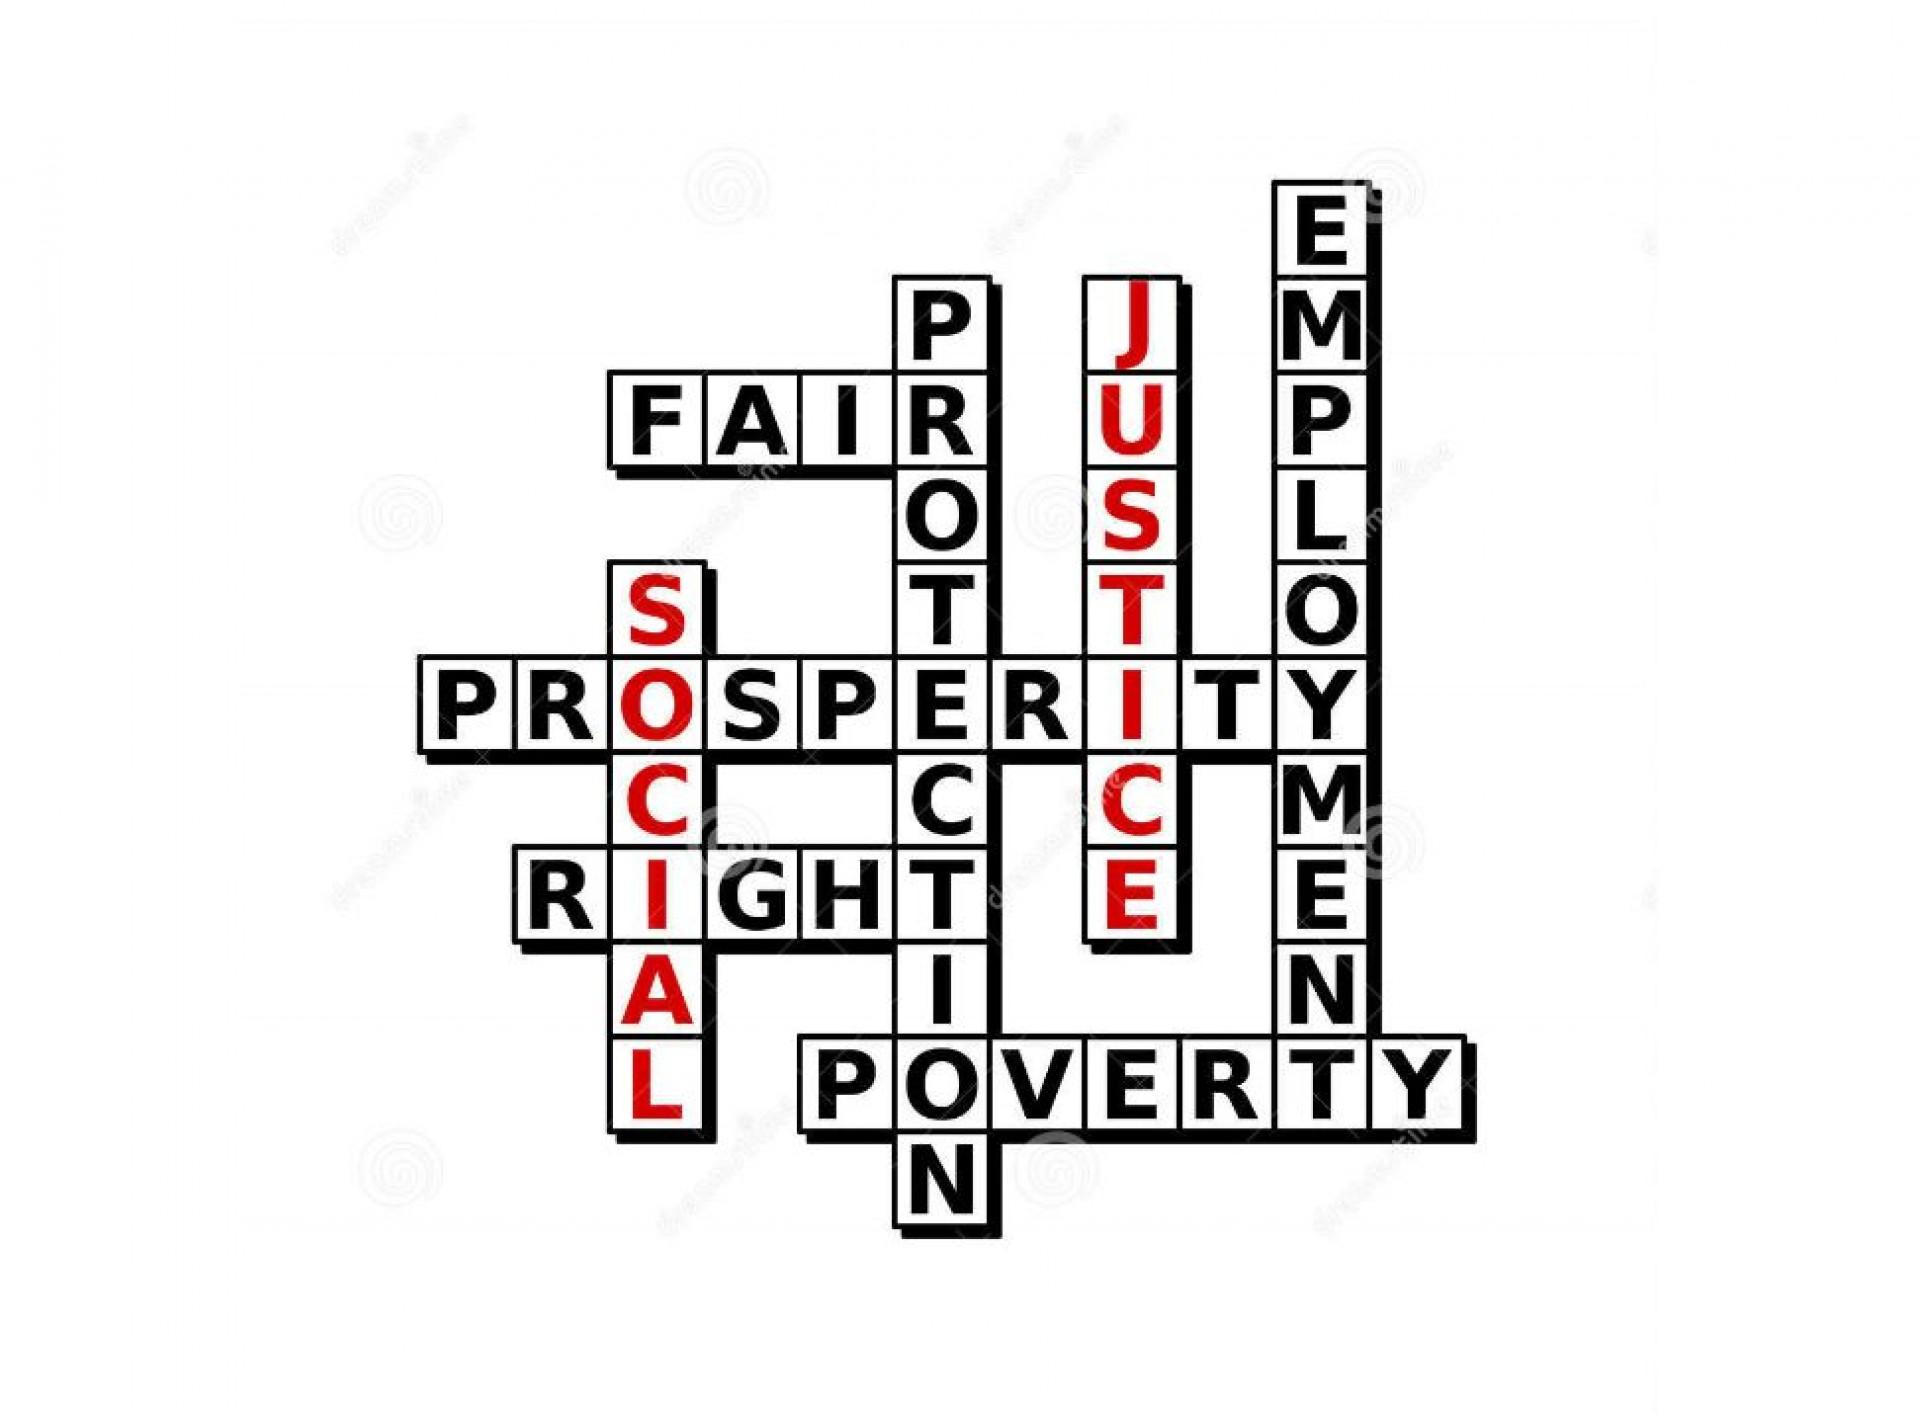 003 Surprising Prosperity Crossword Photo  Sound Clue Material1920